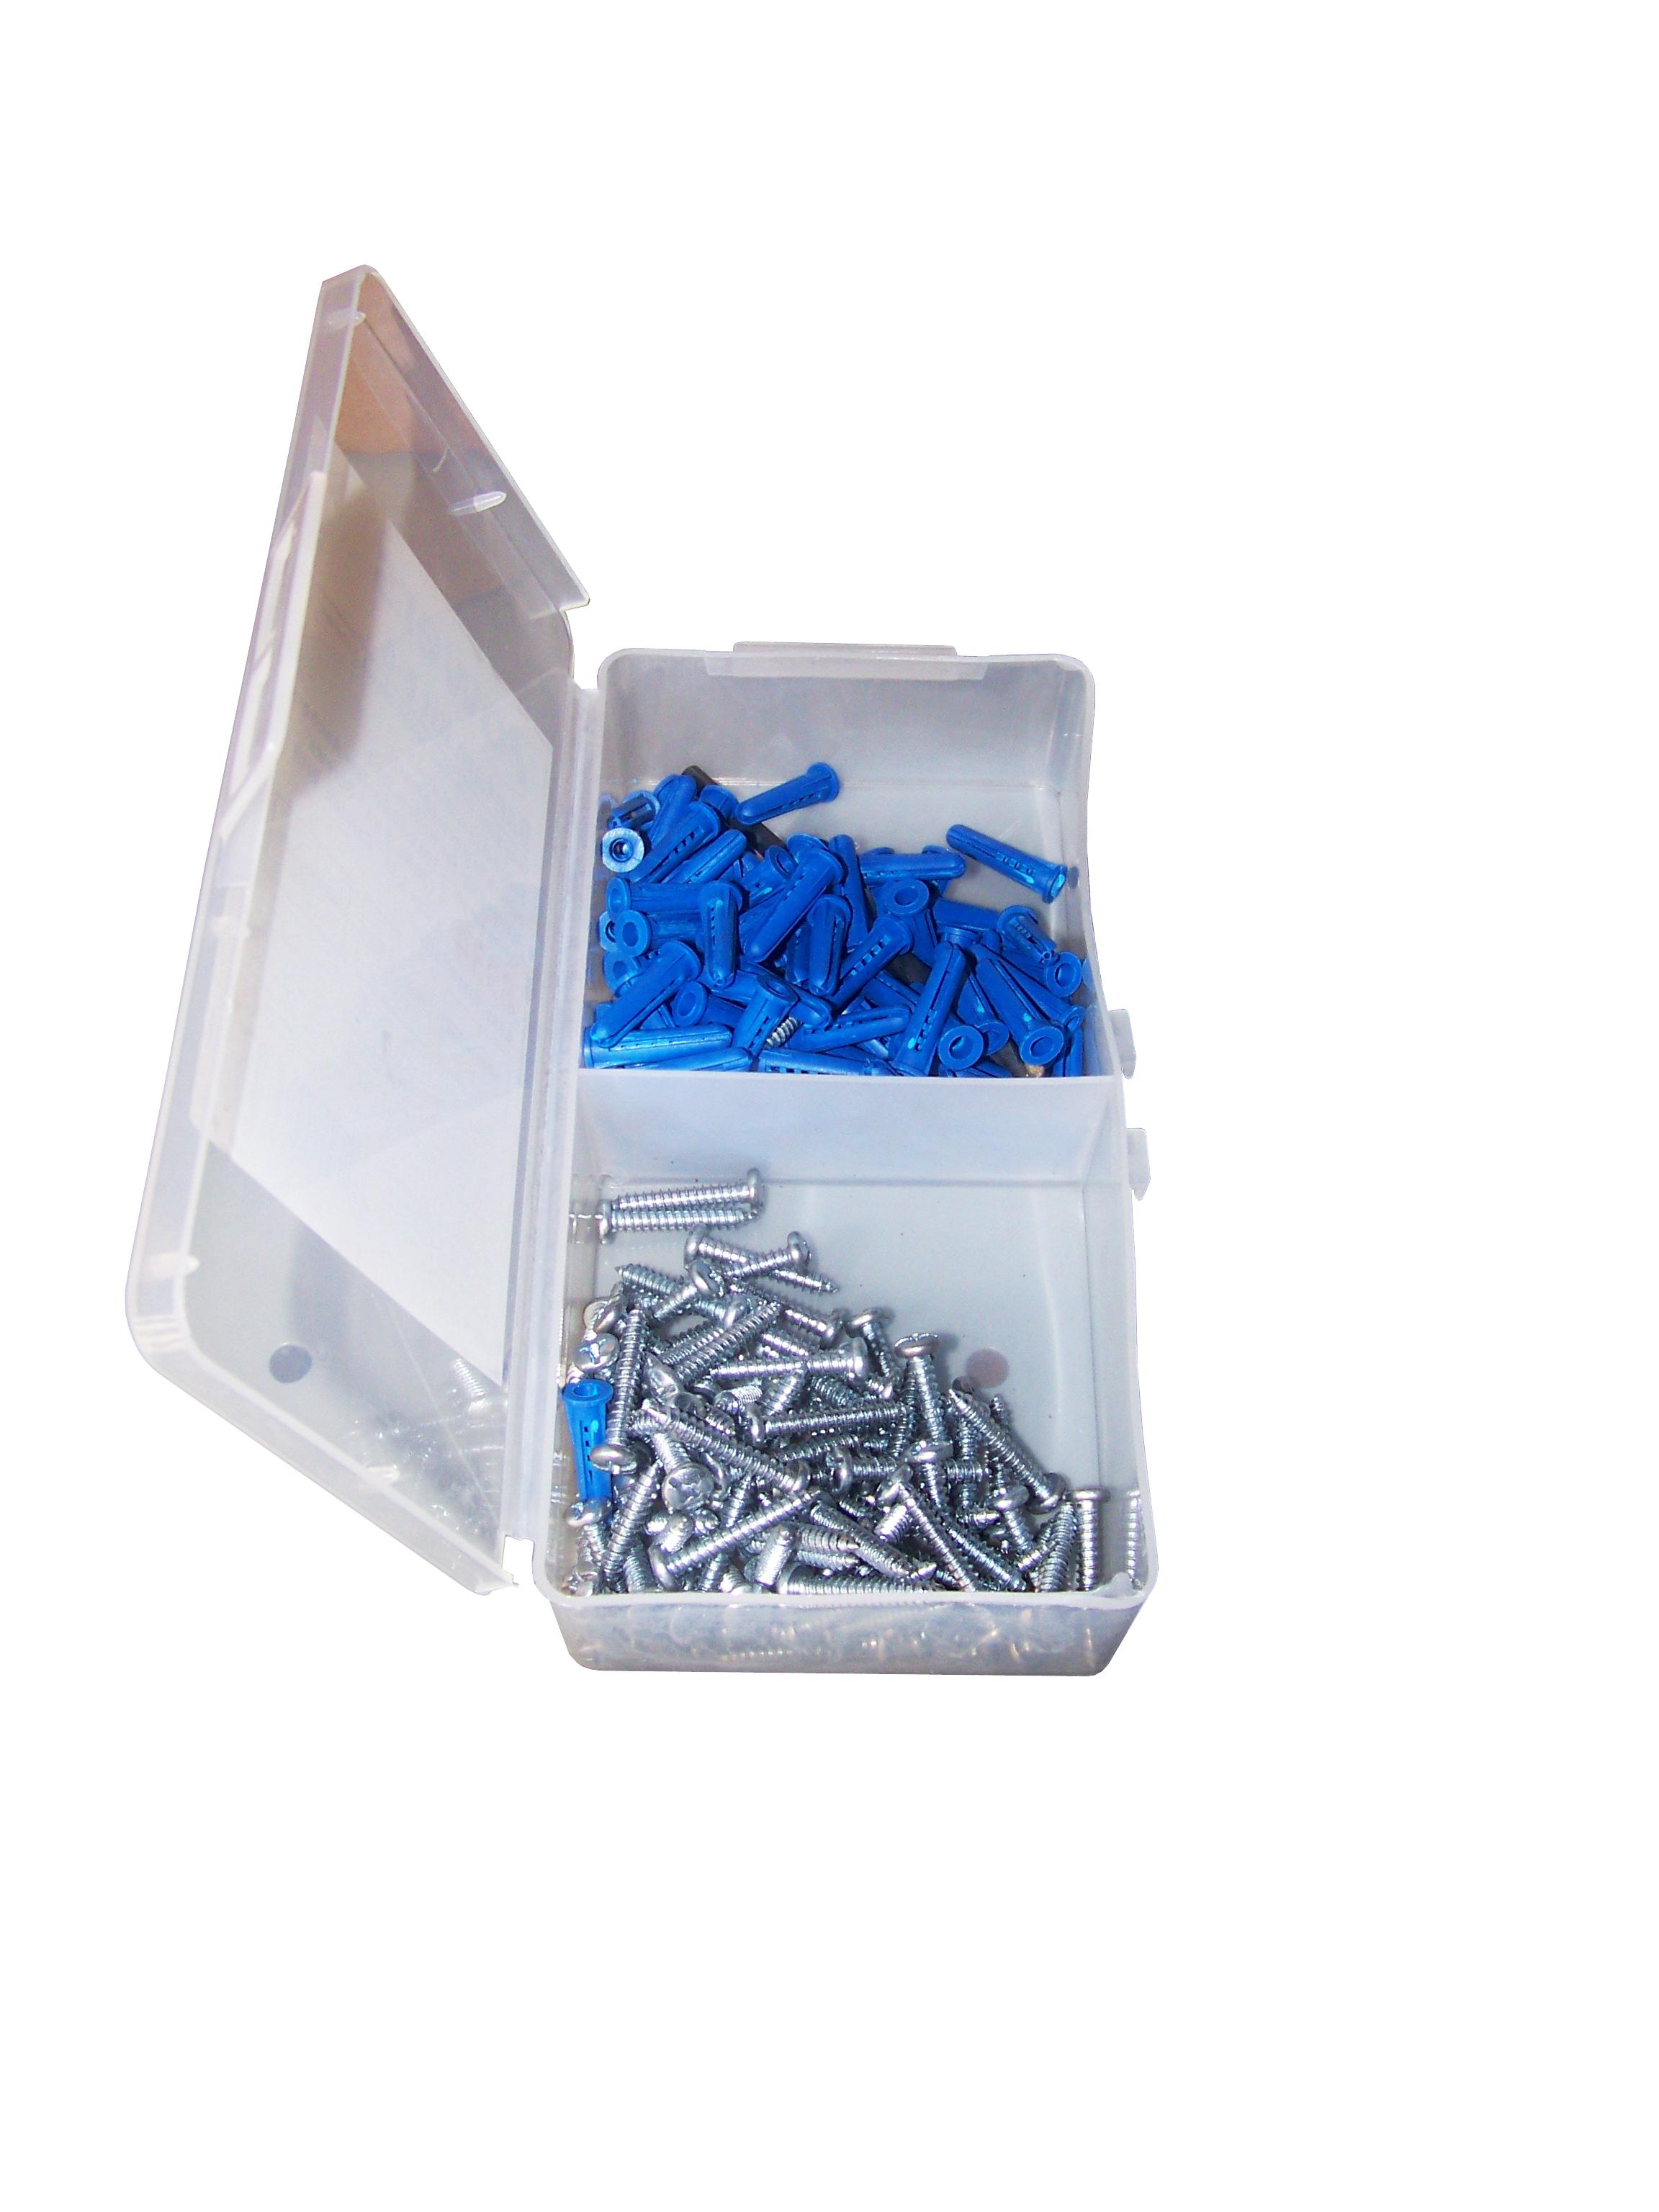 Fasteners Mechanical Anchors Bantam Plug Kits